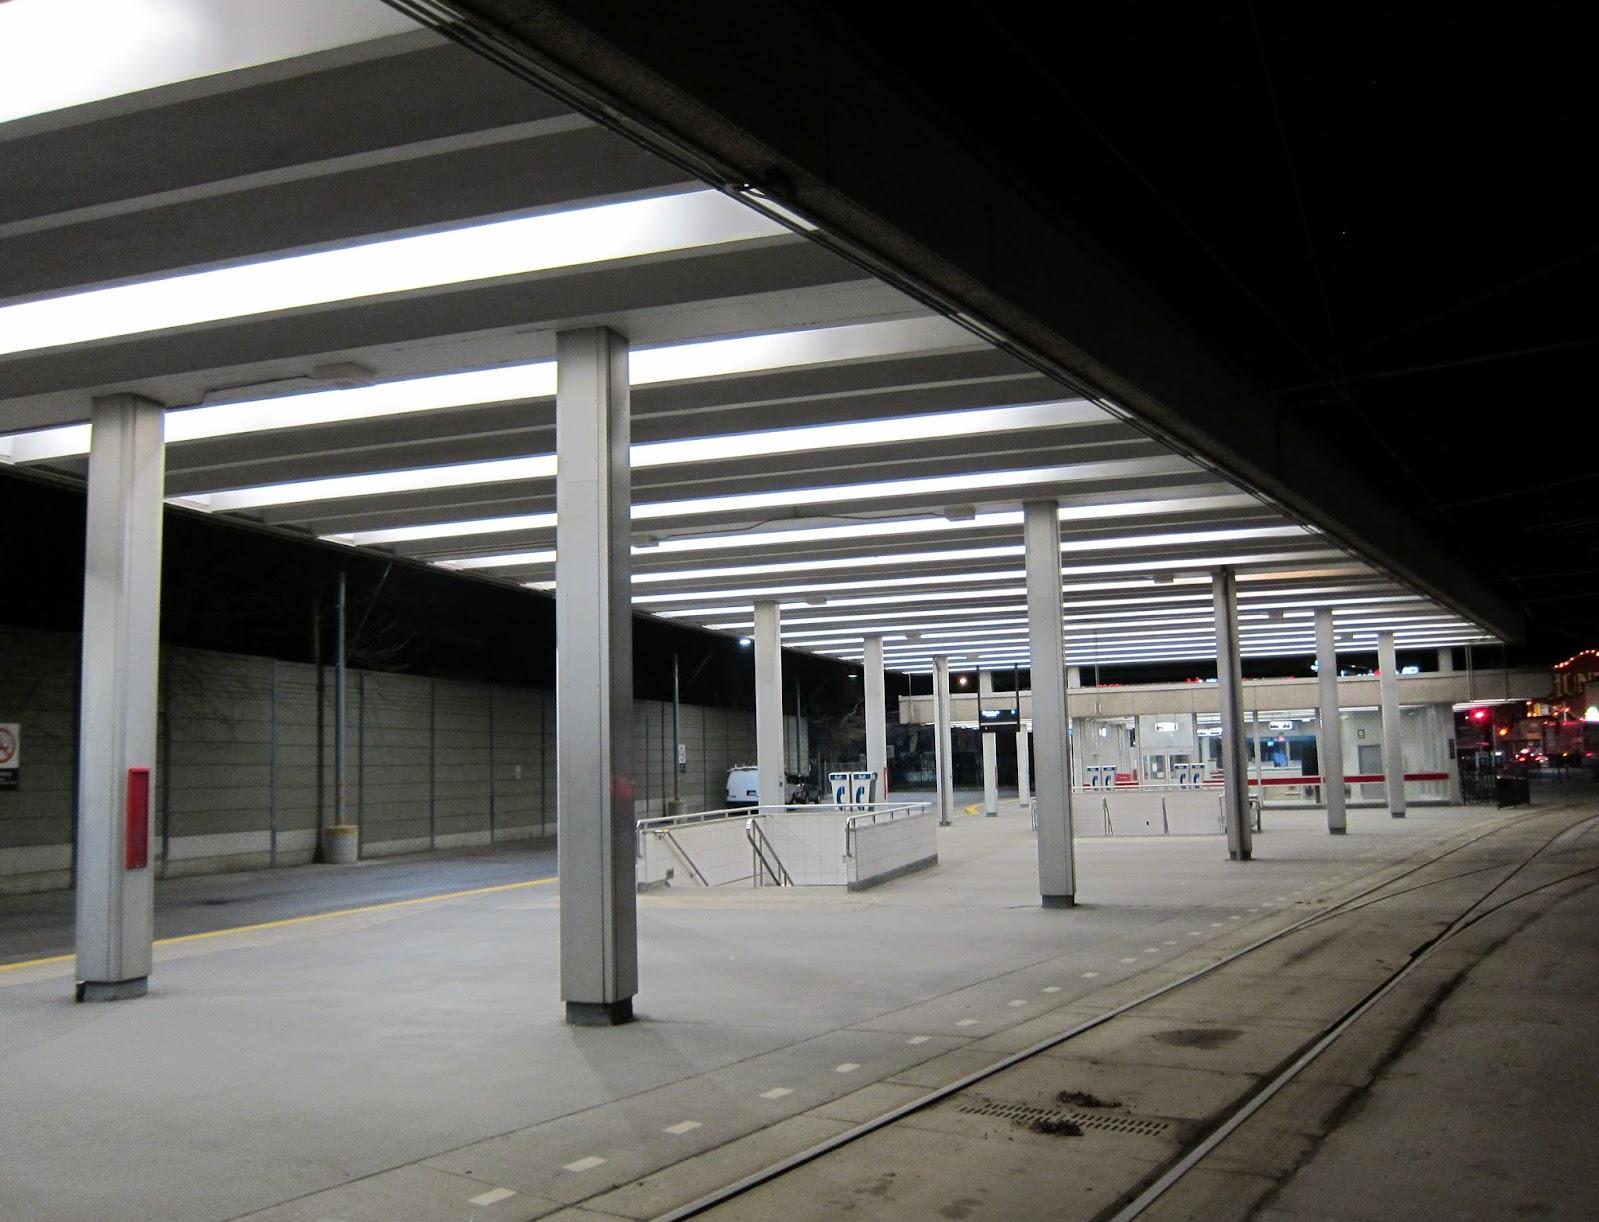 TTC Bathurst station streetcar platform